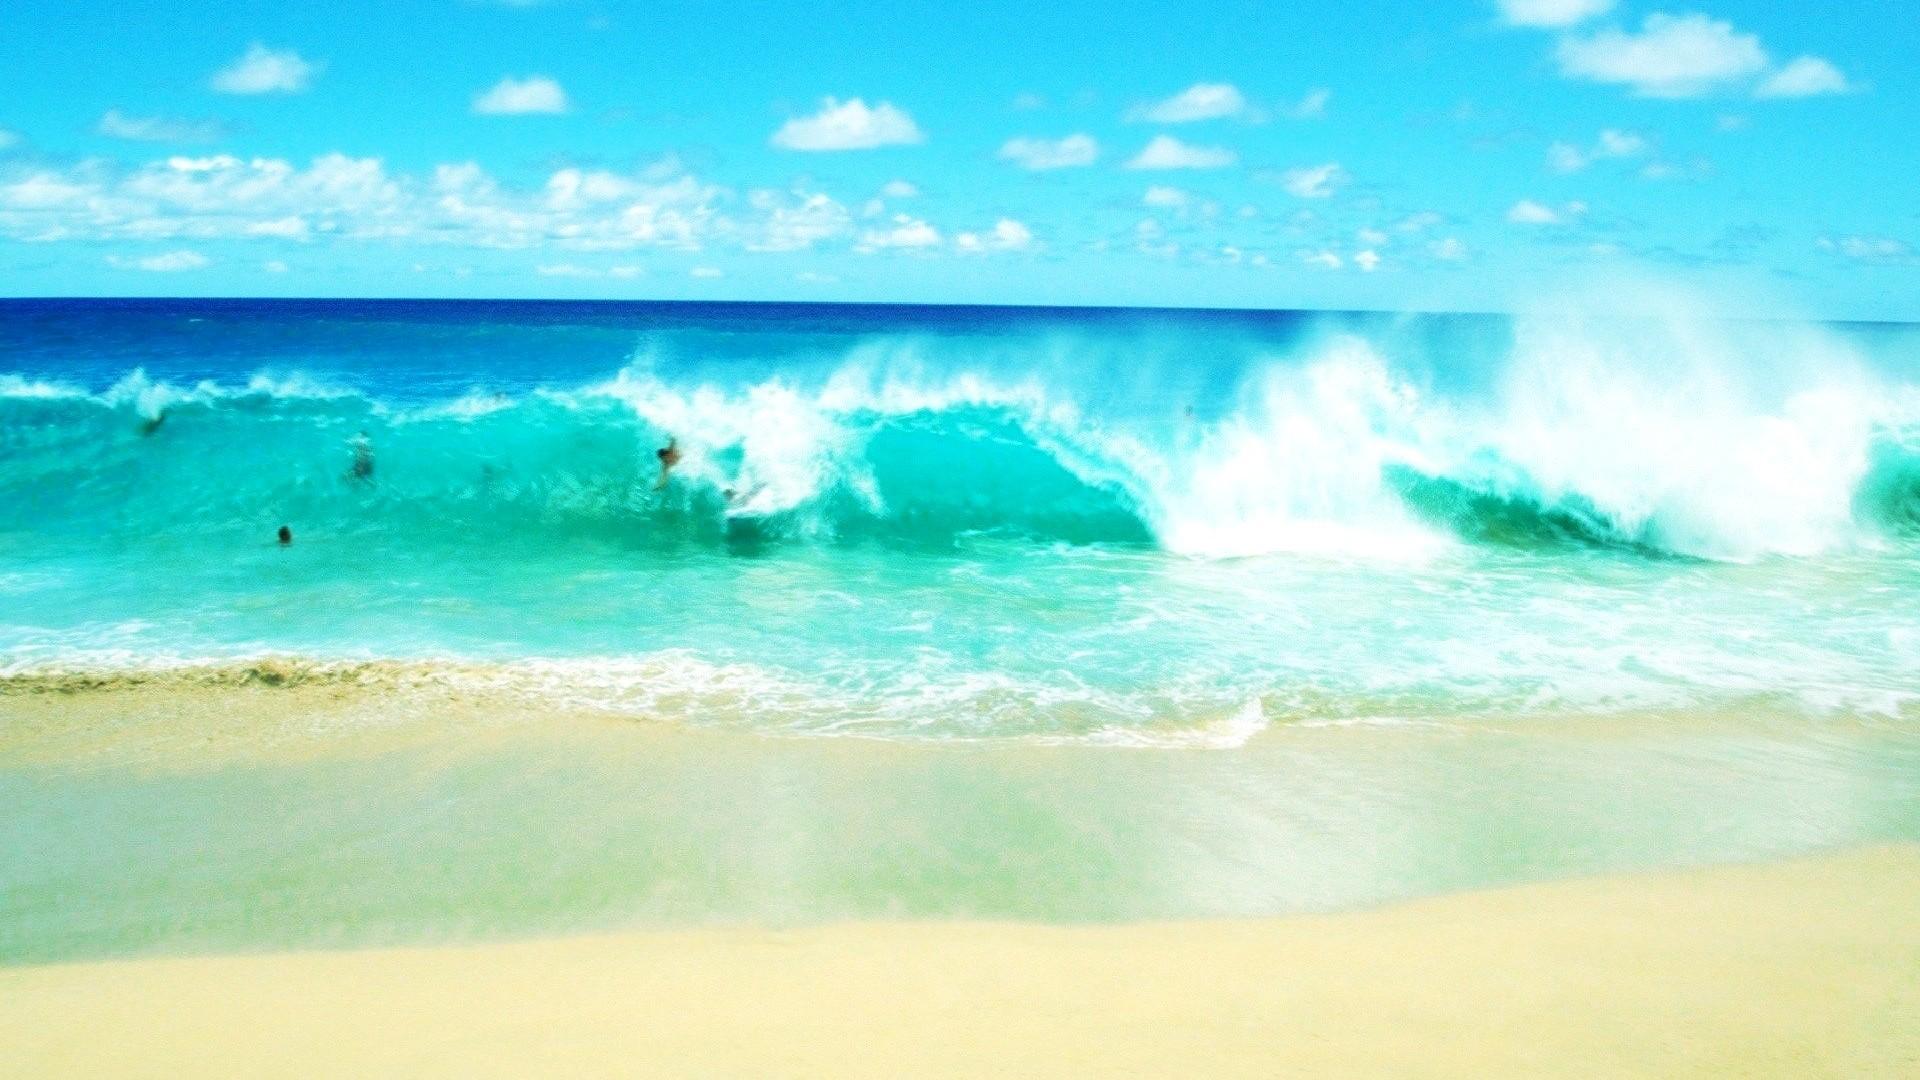 Pretty Girl Wallpapers Hd Surf Beach Desktop Wallpapers Pixelstalk Net